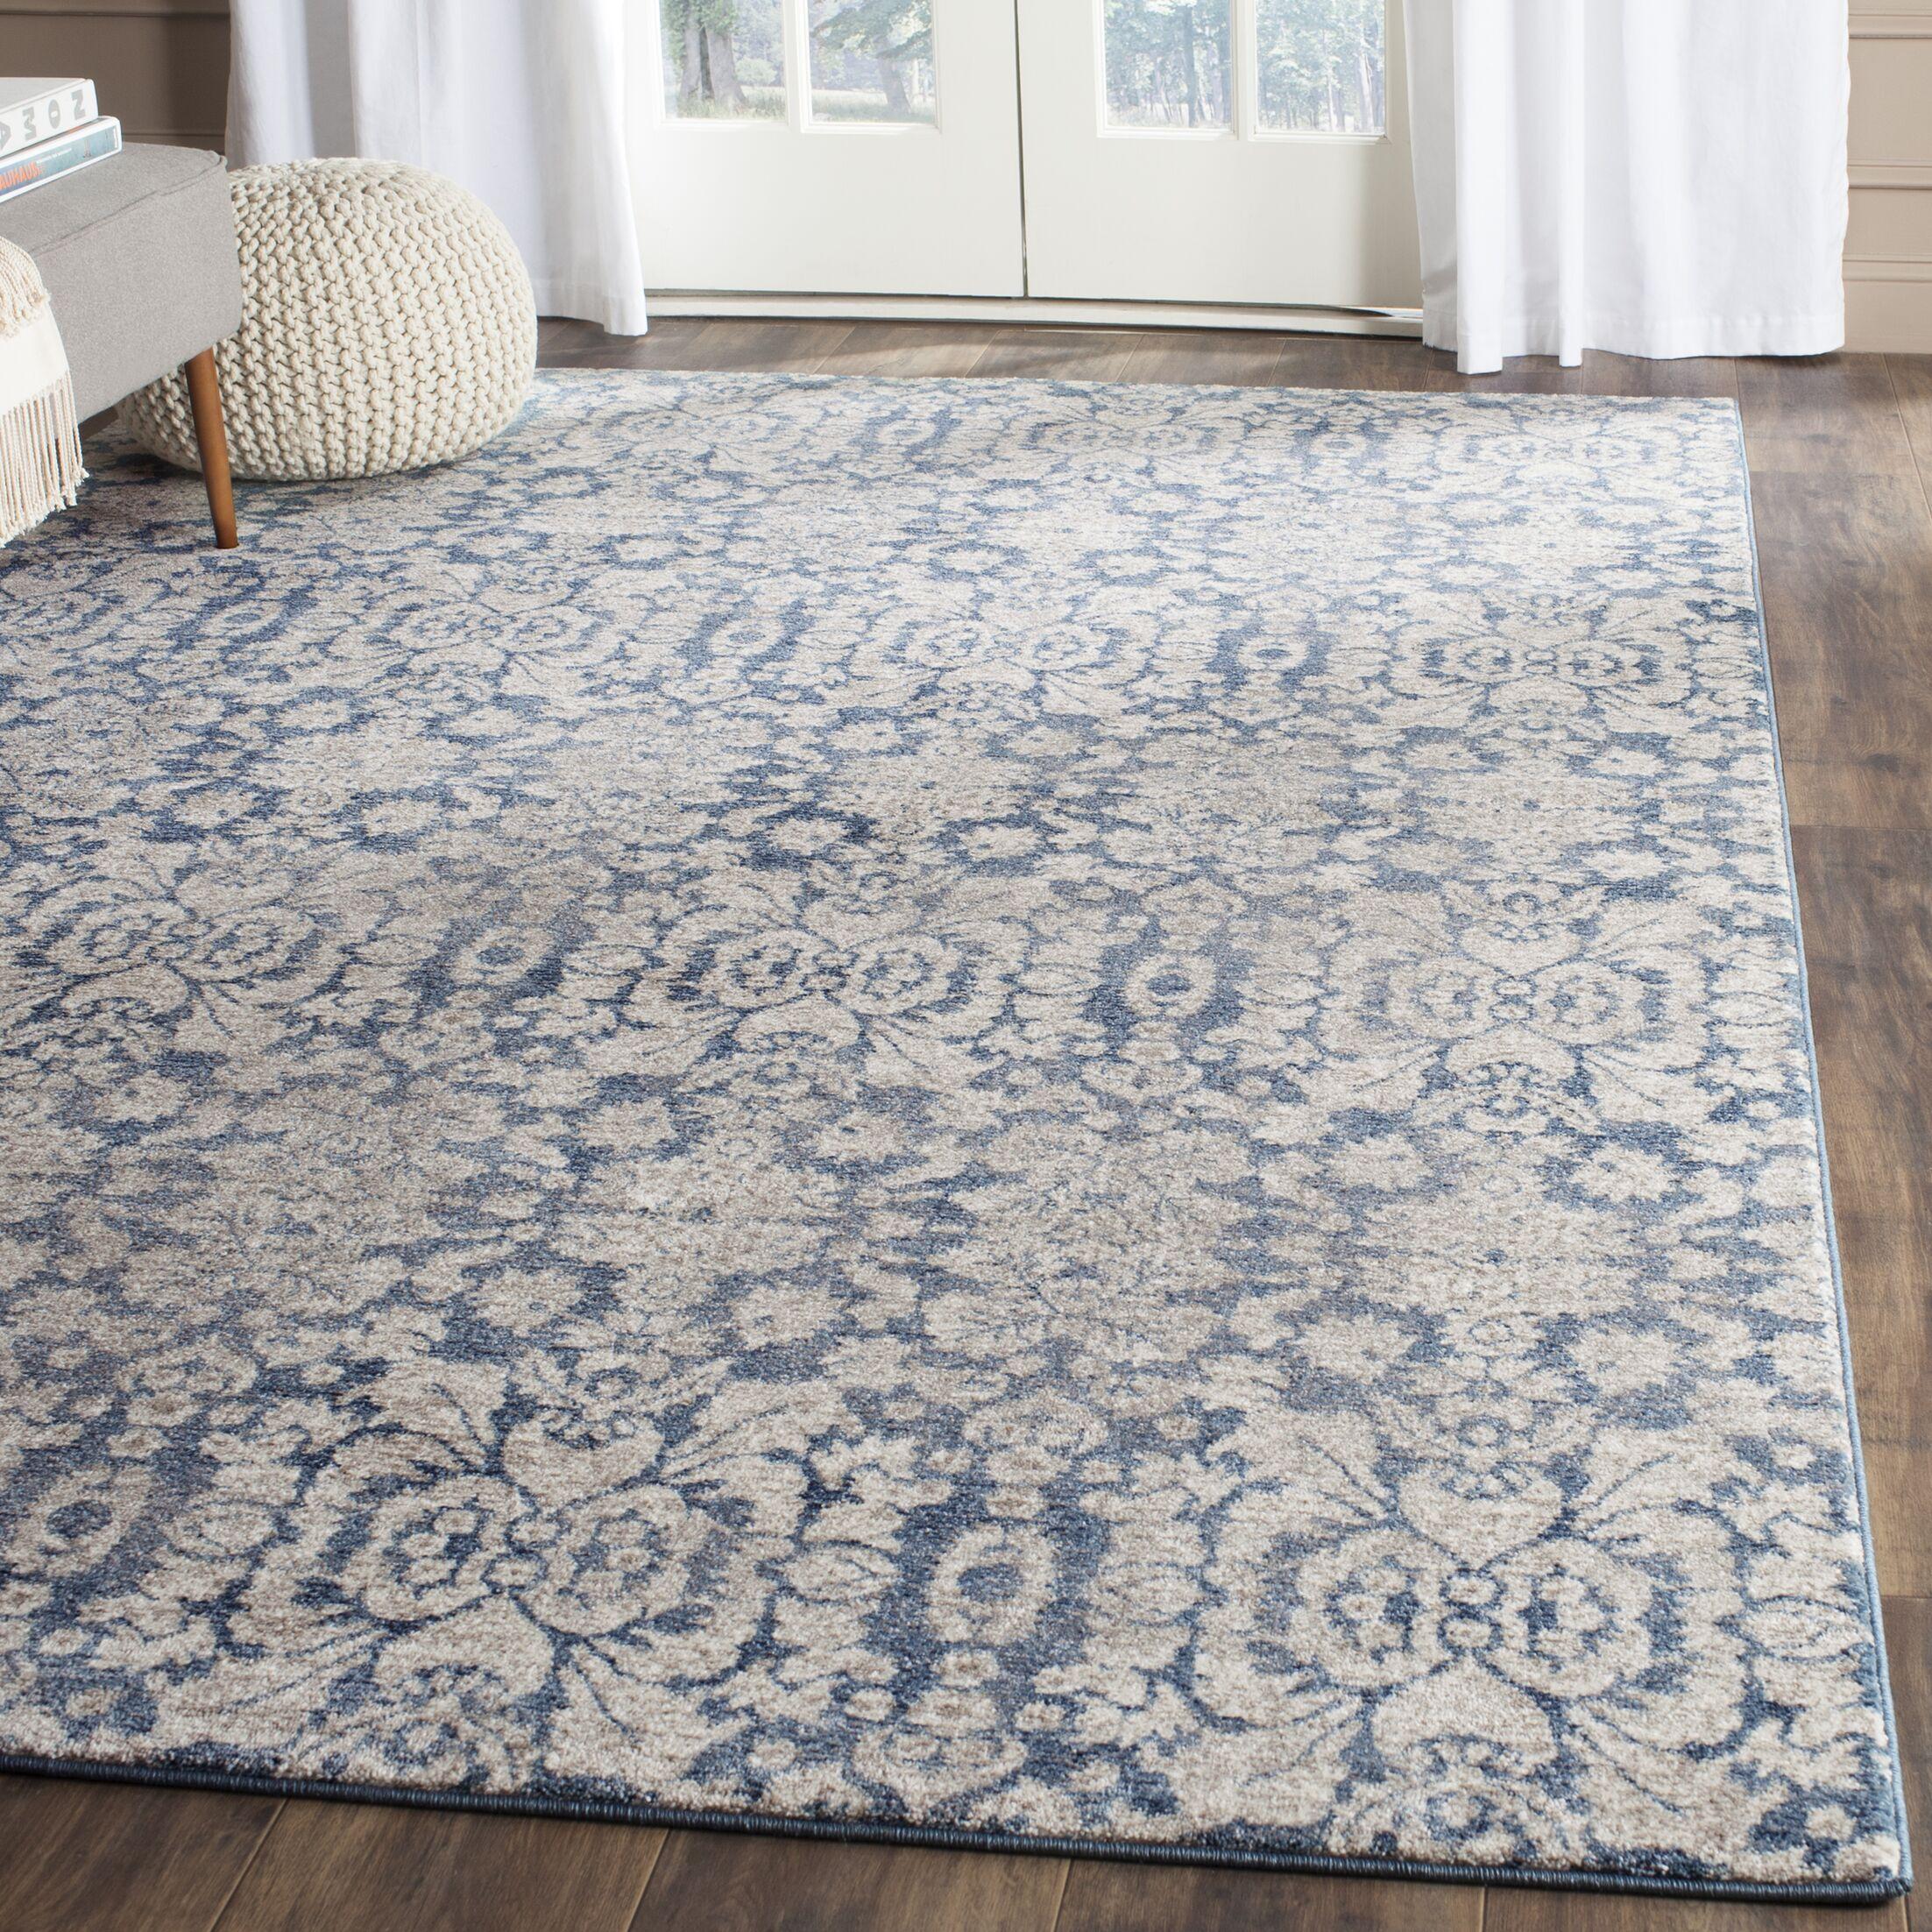 Sofia Blue/Beige Area Rug Rug Size: Rectangle 2' x 3'